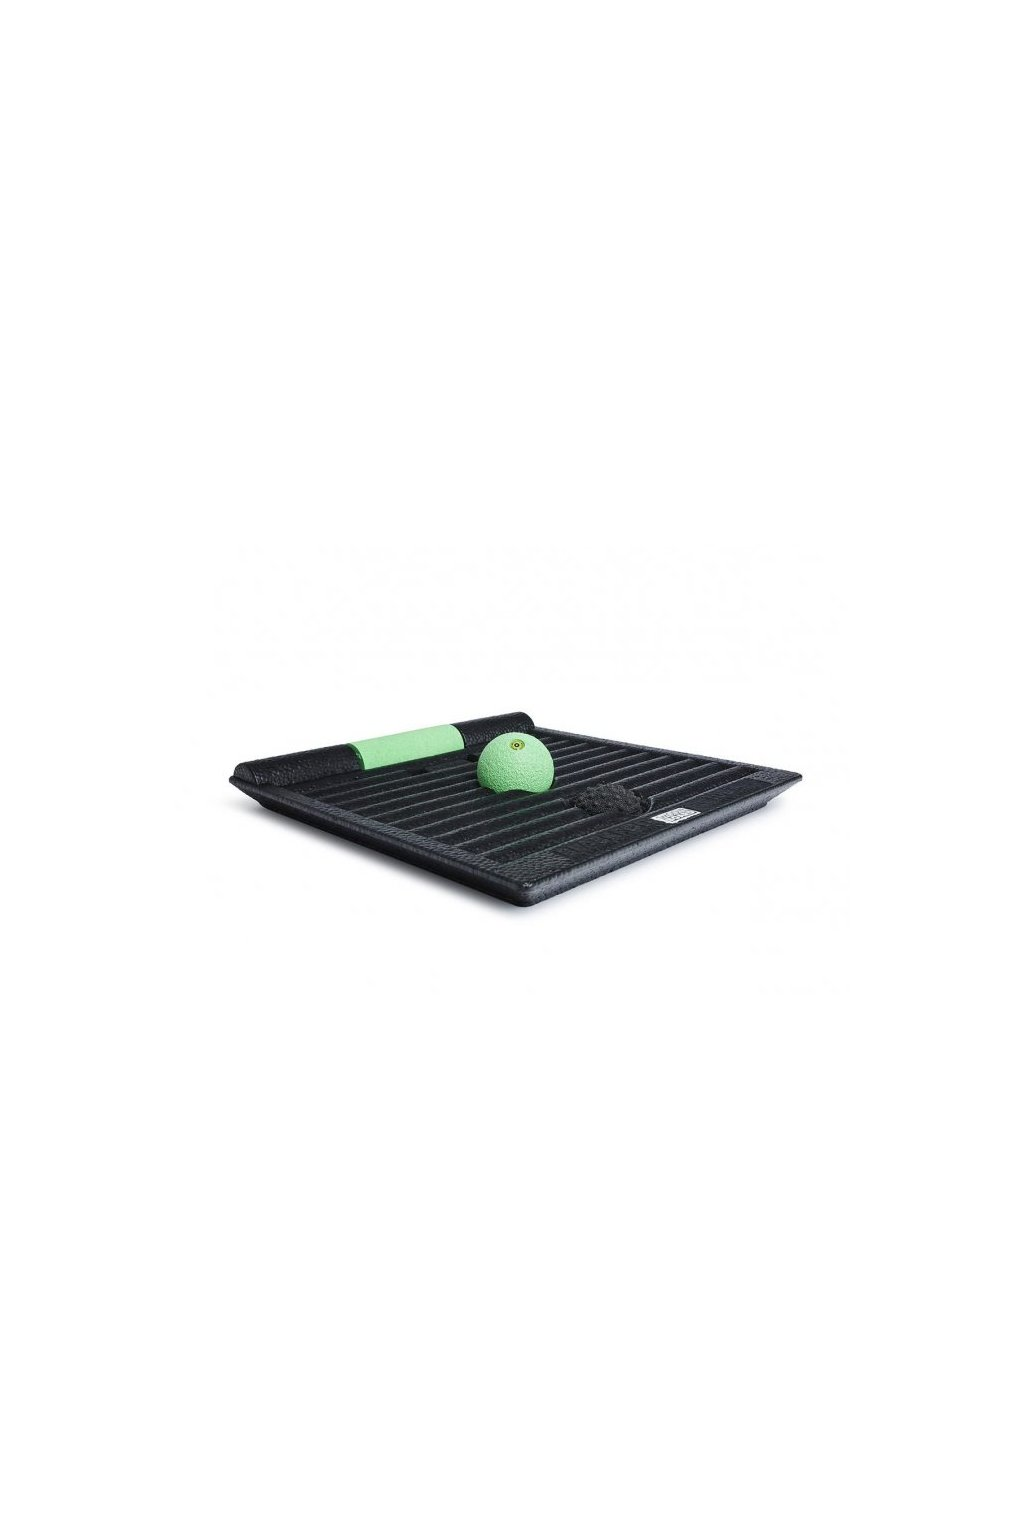 5870 blackroll smoove board black green(1)